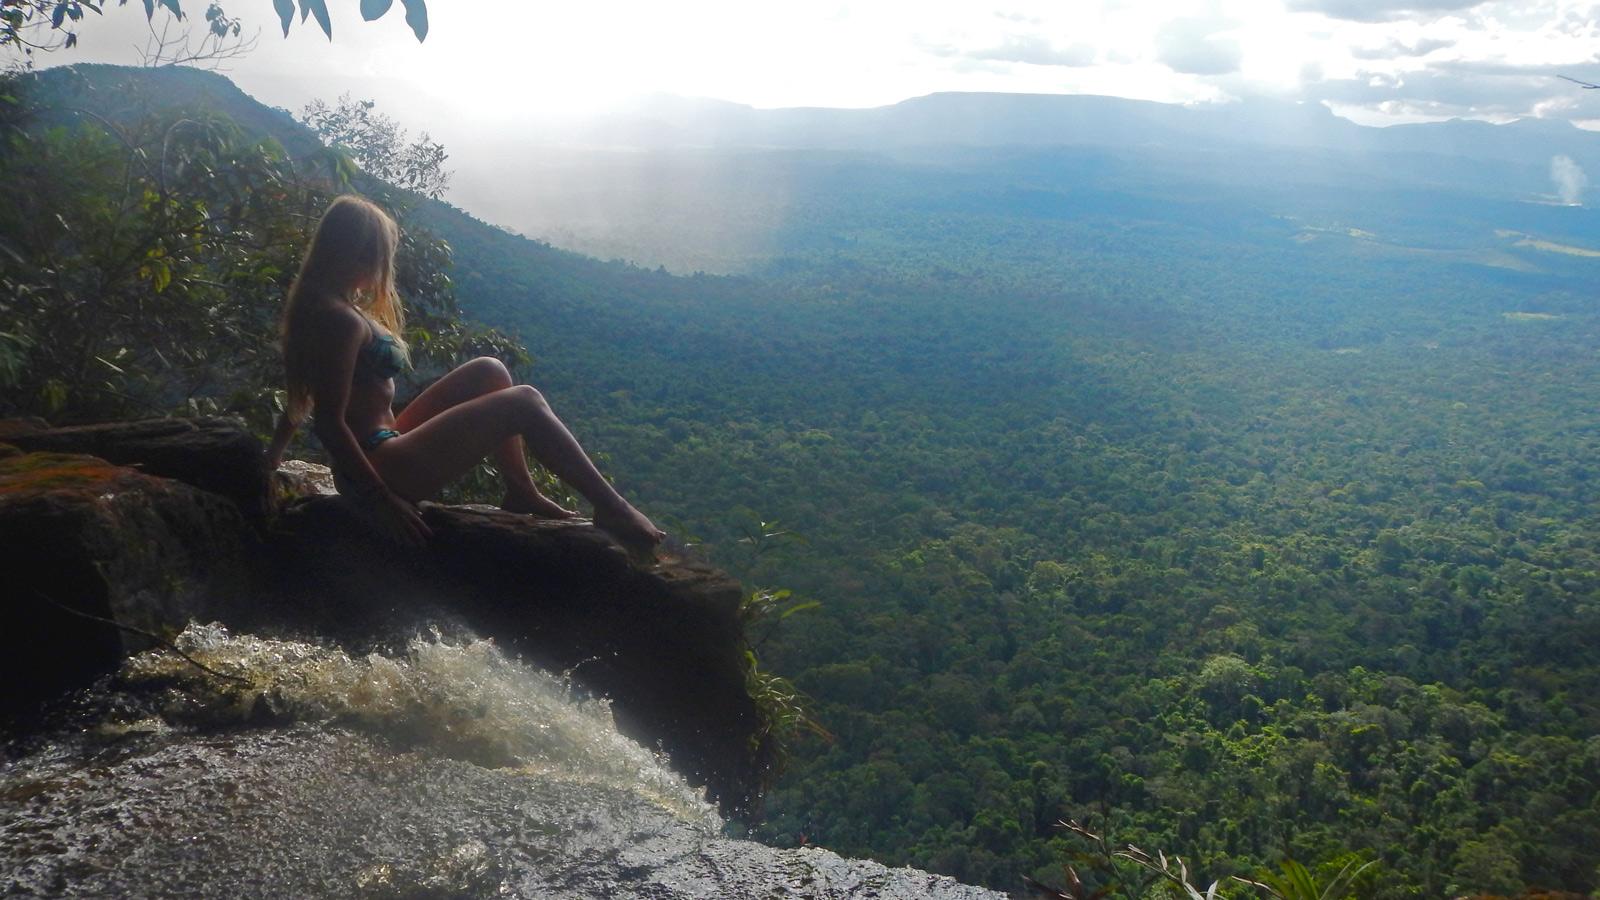 Auyan Tepui Besteigung & Angel Falls Expedition in Venezuela Trekking traveljunkies